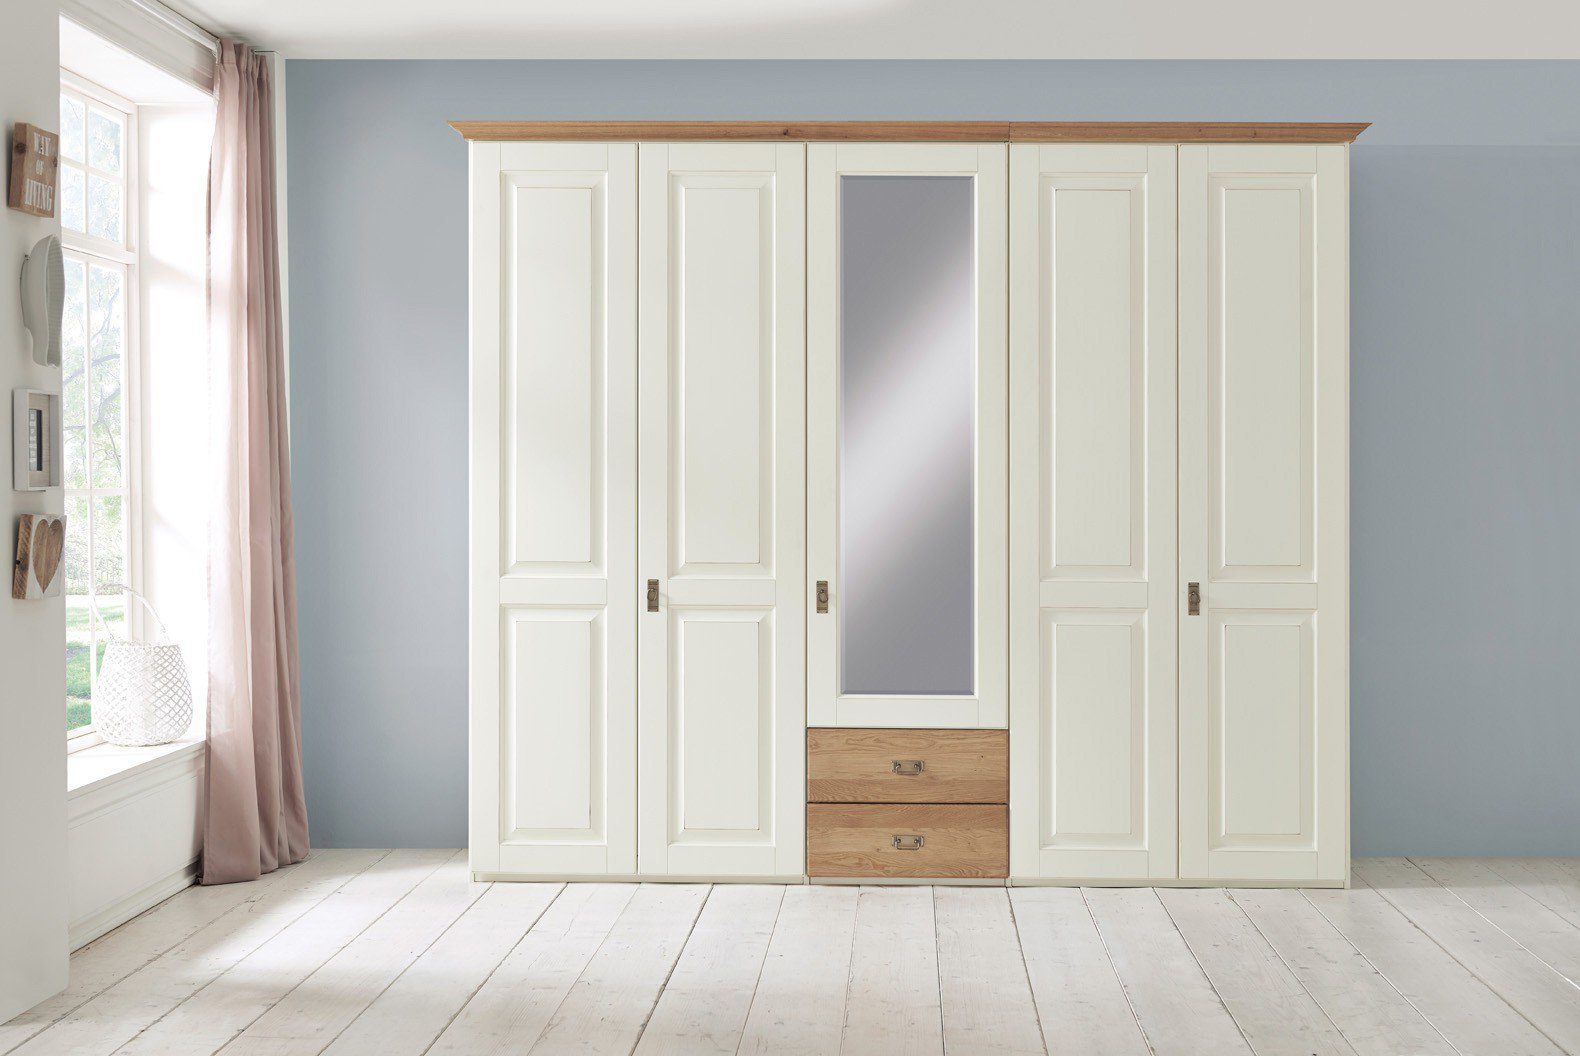 pure natur kleiderschrank kiefer m bel letz ihr online shop. Black Bedroom Furniture Sets. Home Design Ideas